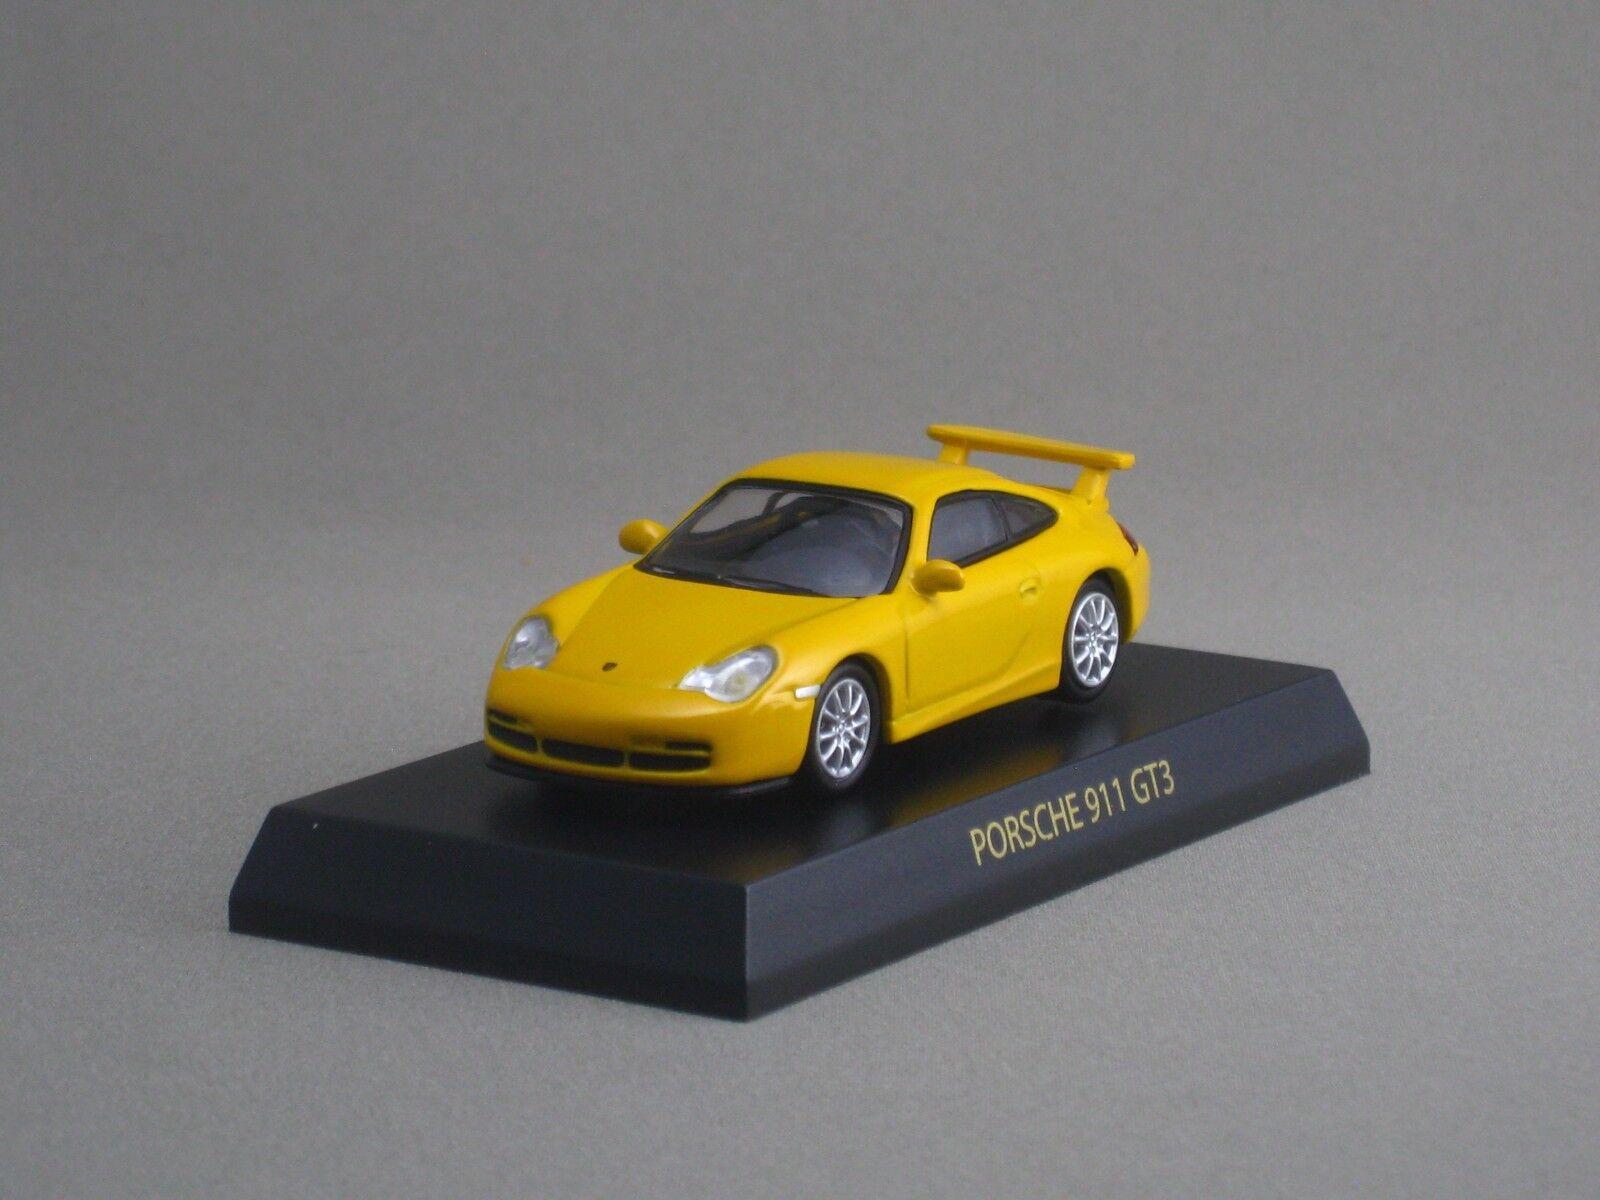 PORSCHE 911 GT3 Yellow Kyosho 1 64 Scale Diecast Model Car